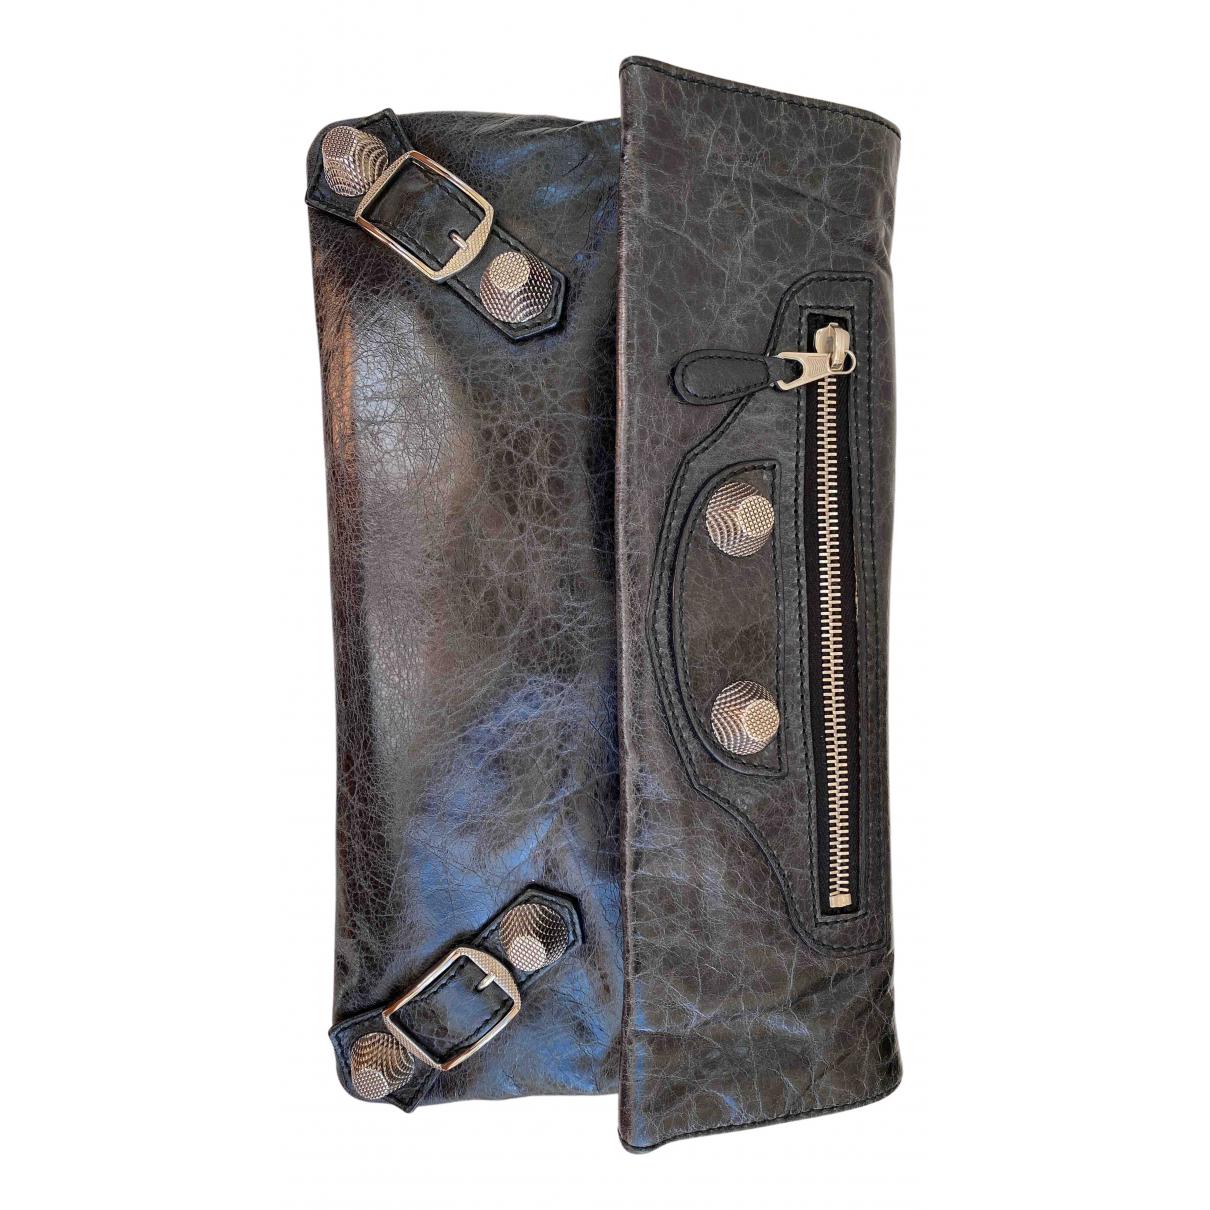 Balenciaga Envelop Black Leather Clutch bag for Women N